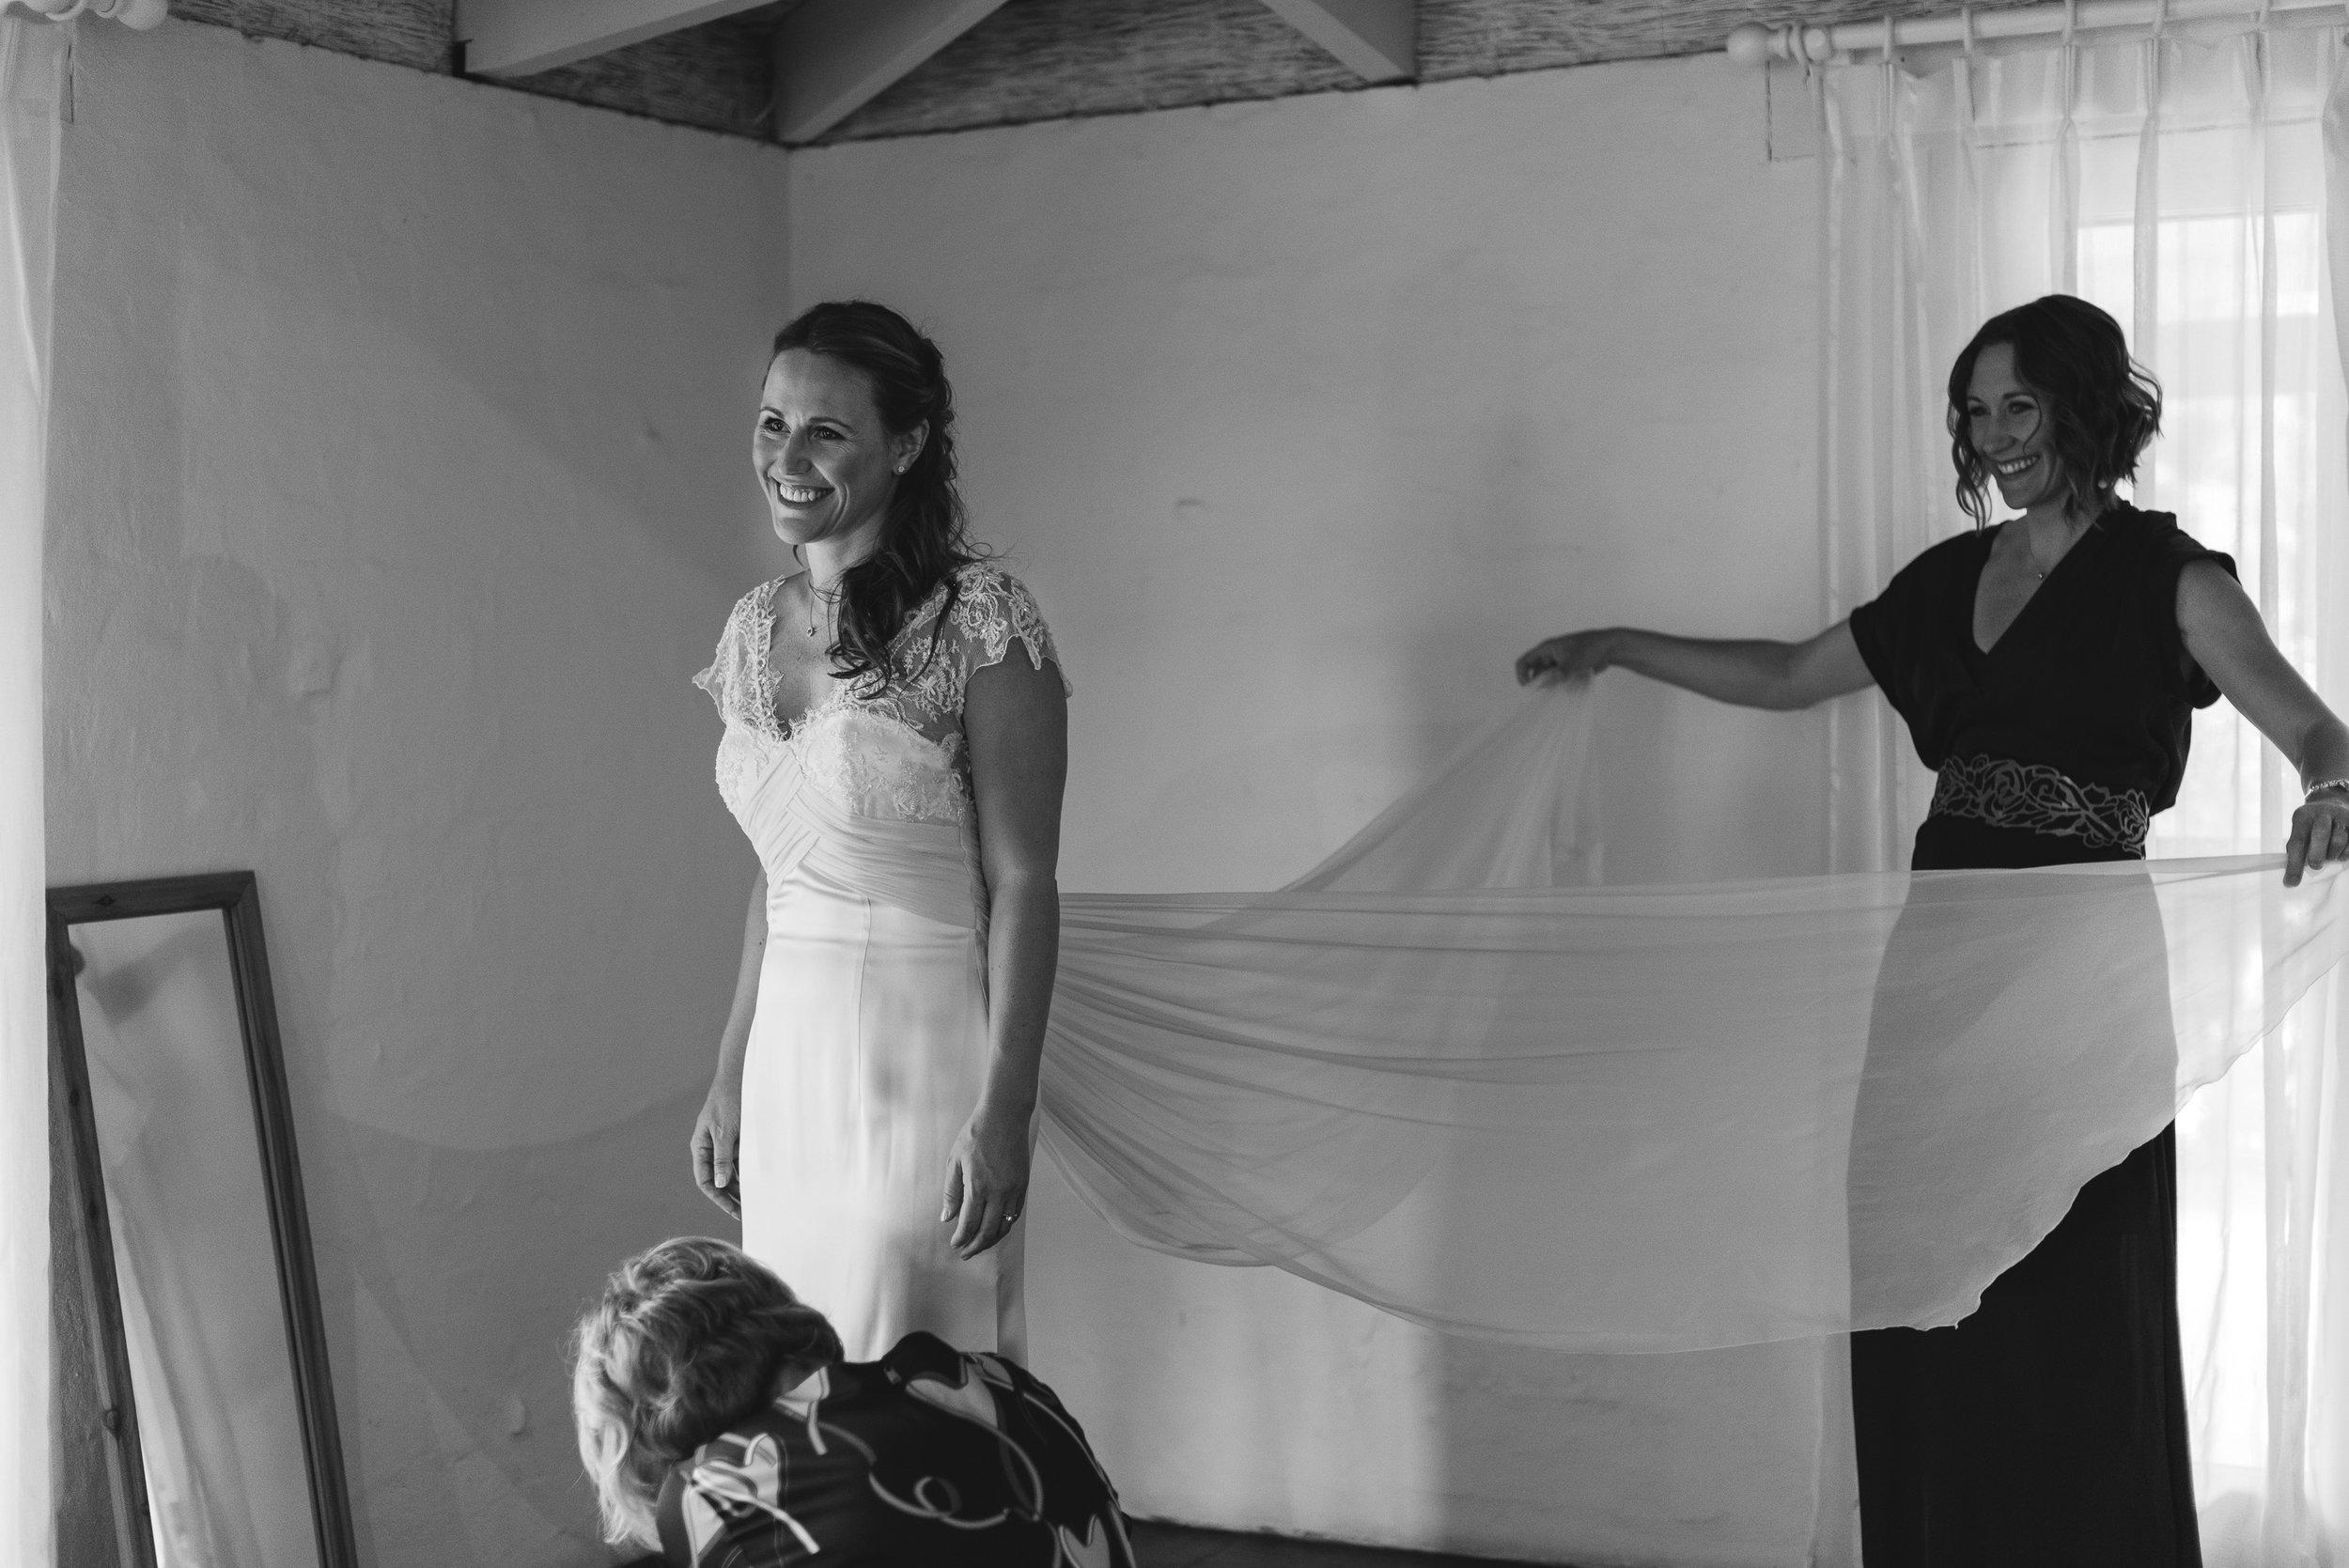 weddings by atelier photography-wedding-14.jpg